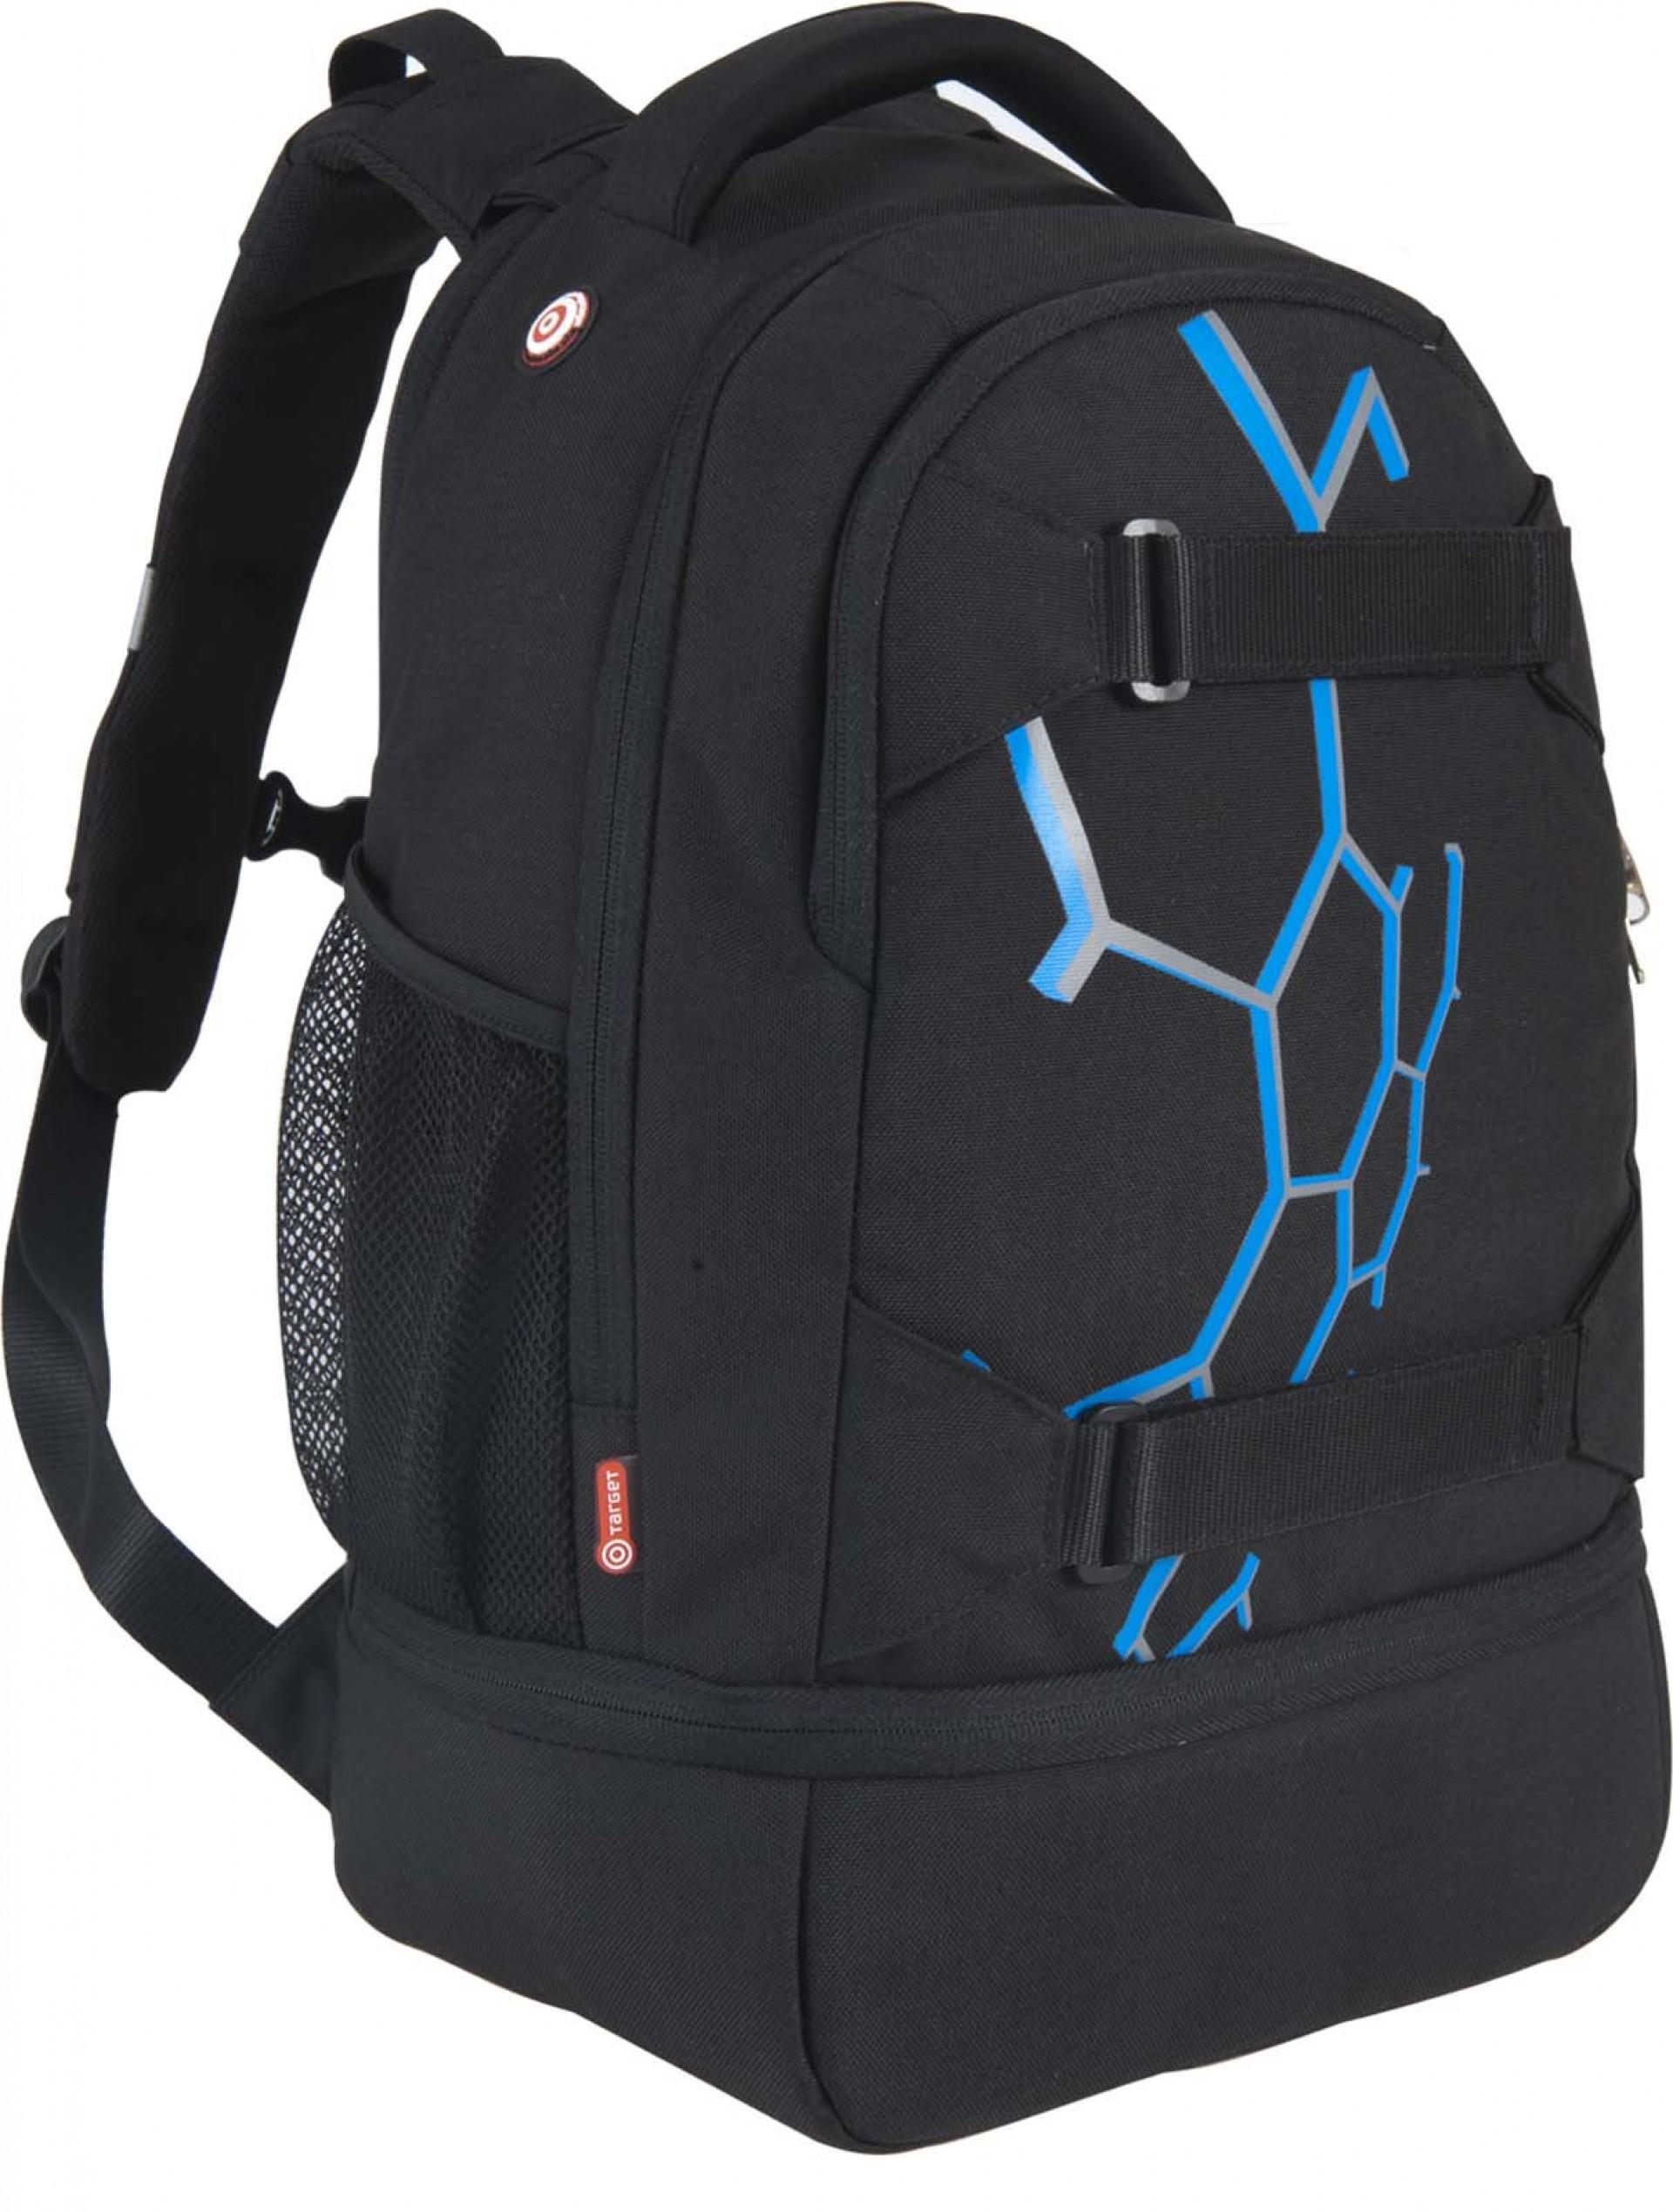 BACKPACK CHAMP XT 055.2 EXO SKY 23937 | Target Backpacks